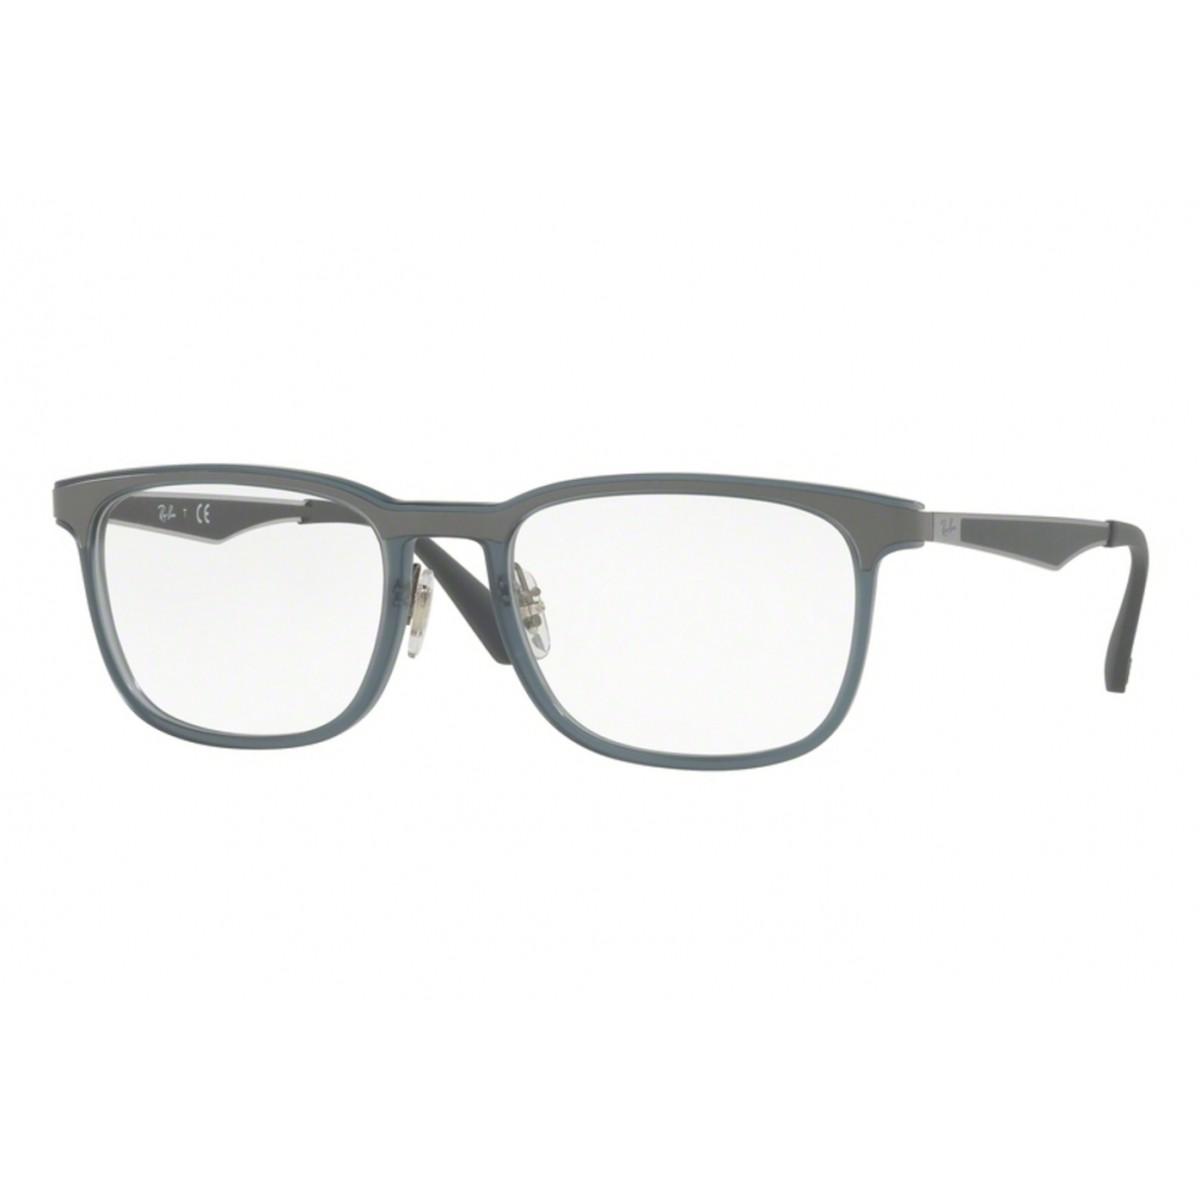 Óculos De Grau Ray Ban Masculino RB7163 5679 Tam.55